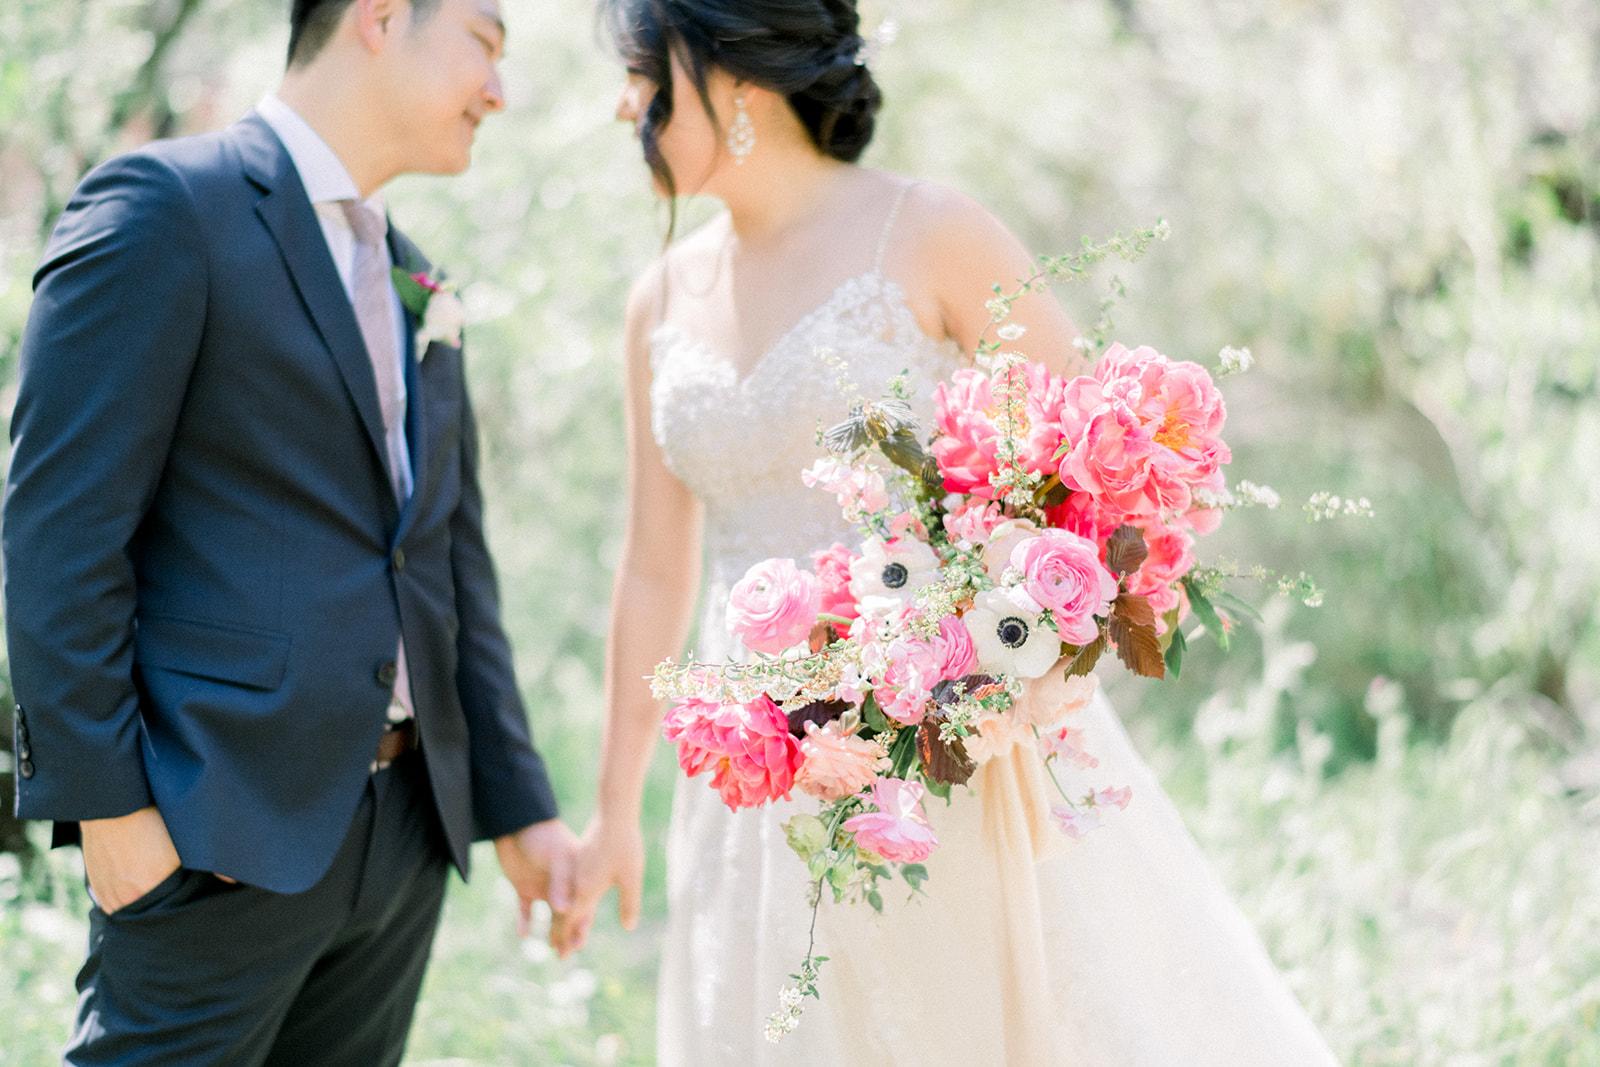 jueunandjon-etherandsmith-wedding-345.jpg